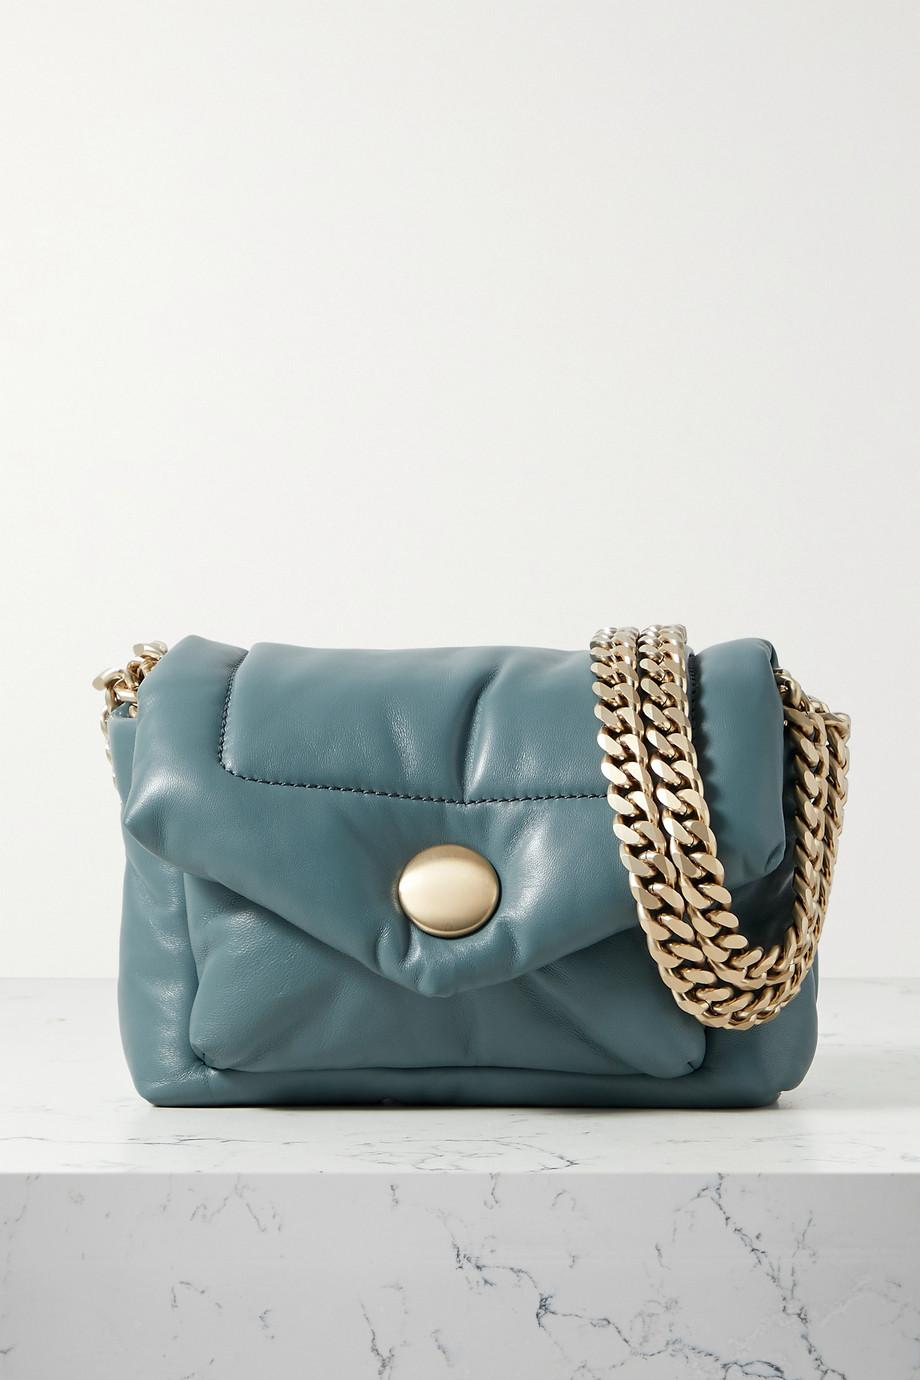 Proenza Schouler Quilted leather shoulder bag